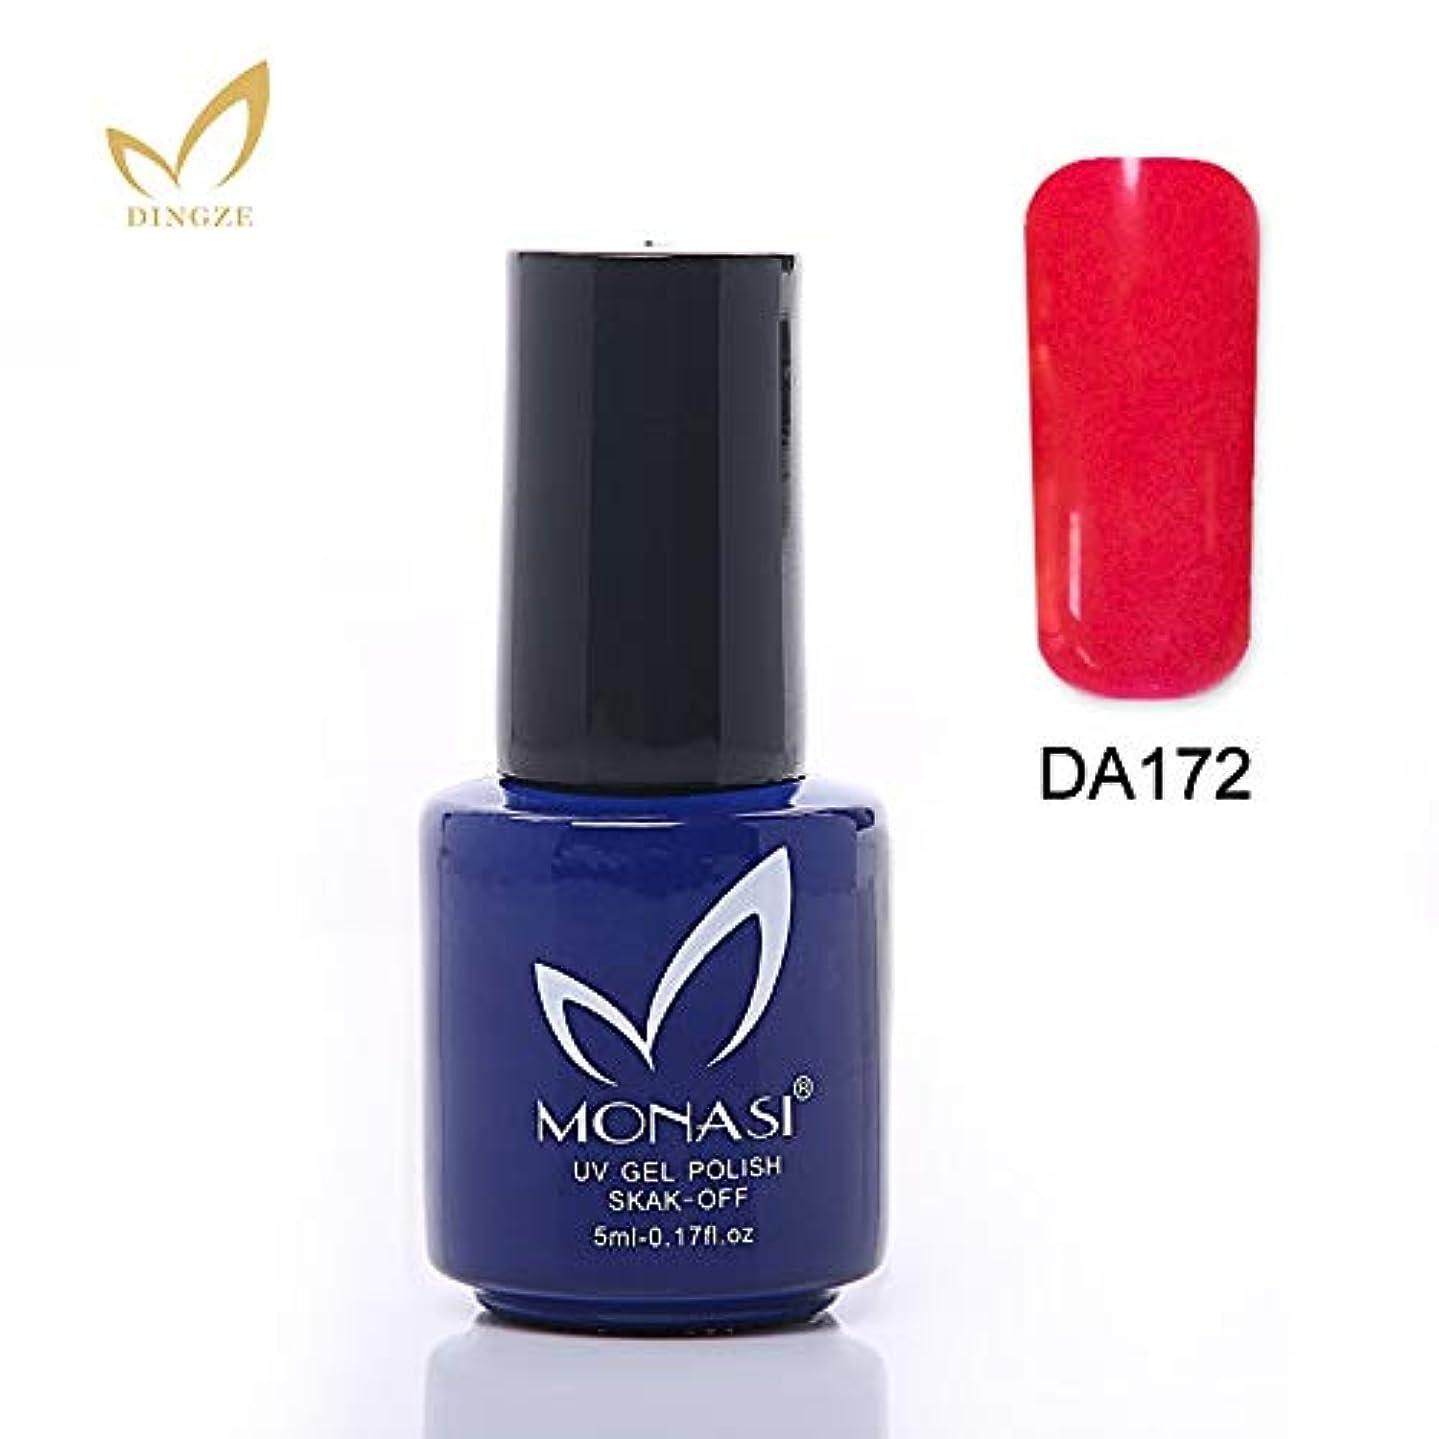 Generic Monasi 15 Colors Glaze Soak Off UV Gel Varnish Lacquer Stained Glass Vernis Semi Permanent Manicure Nail Art Decoration Polish Color DA172